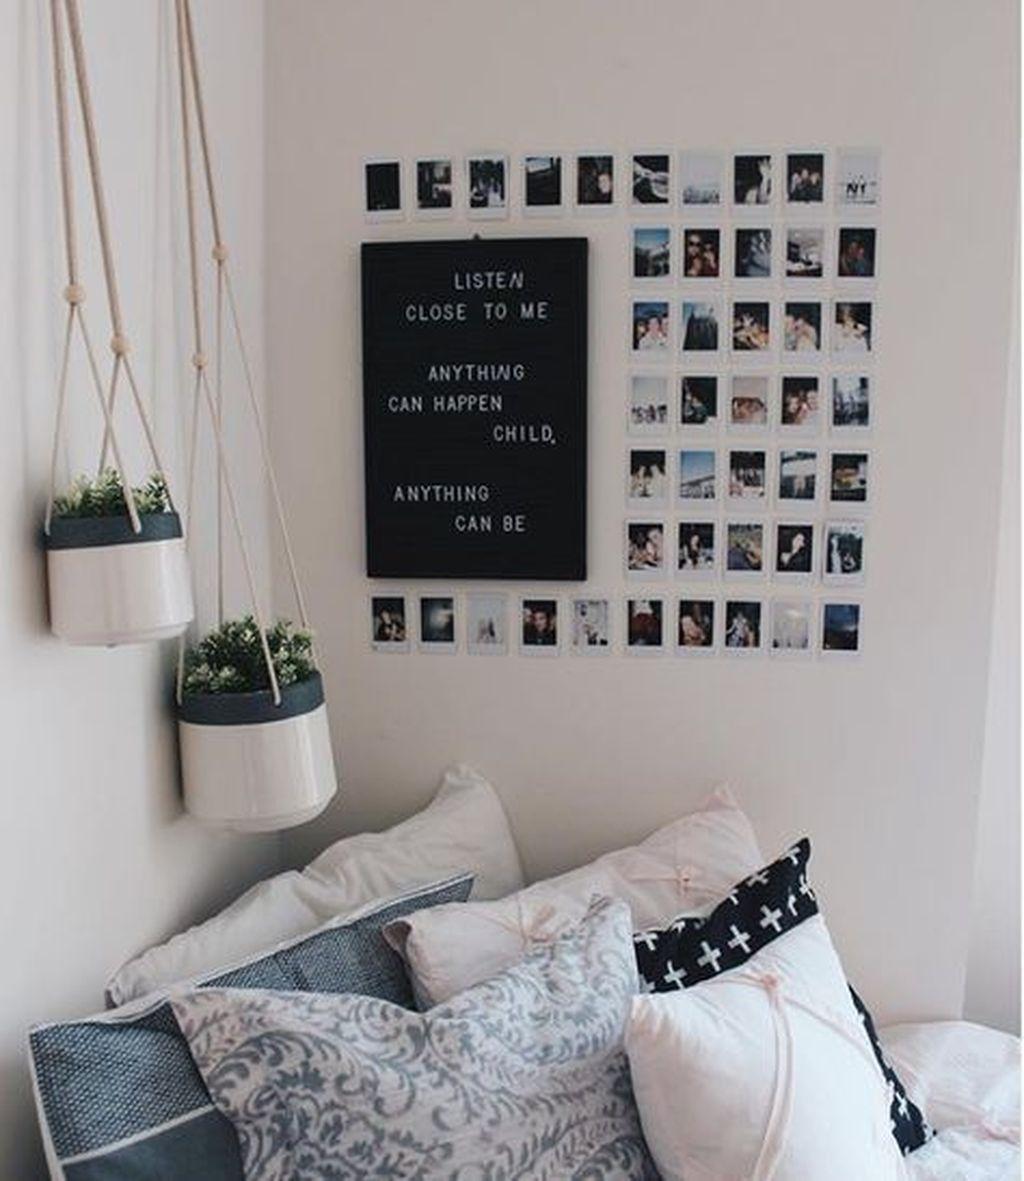 61 Efficient Dorm Room Organization Decor Ideas | Dorm, Dorm room ...